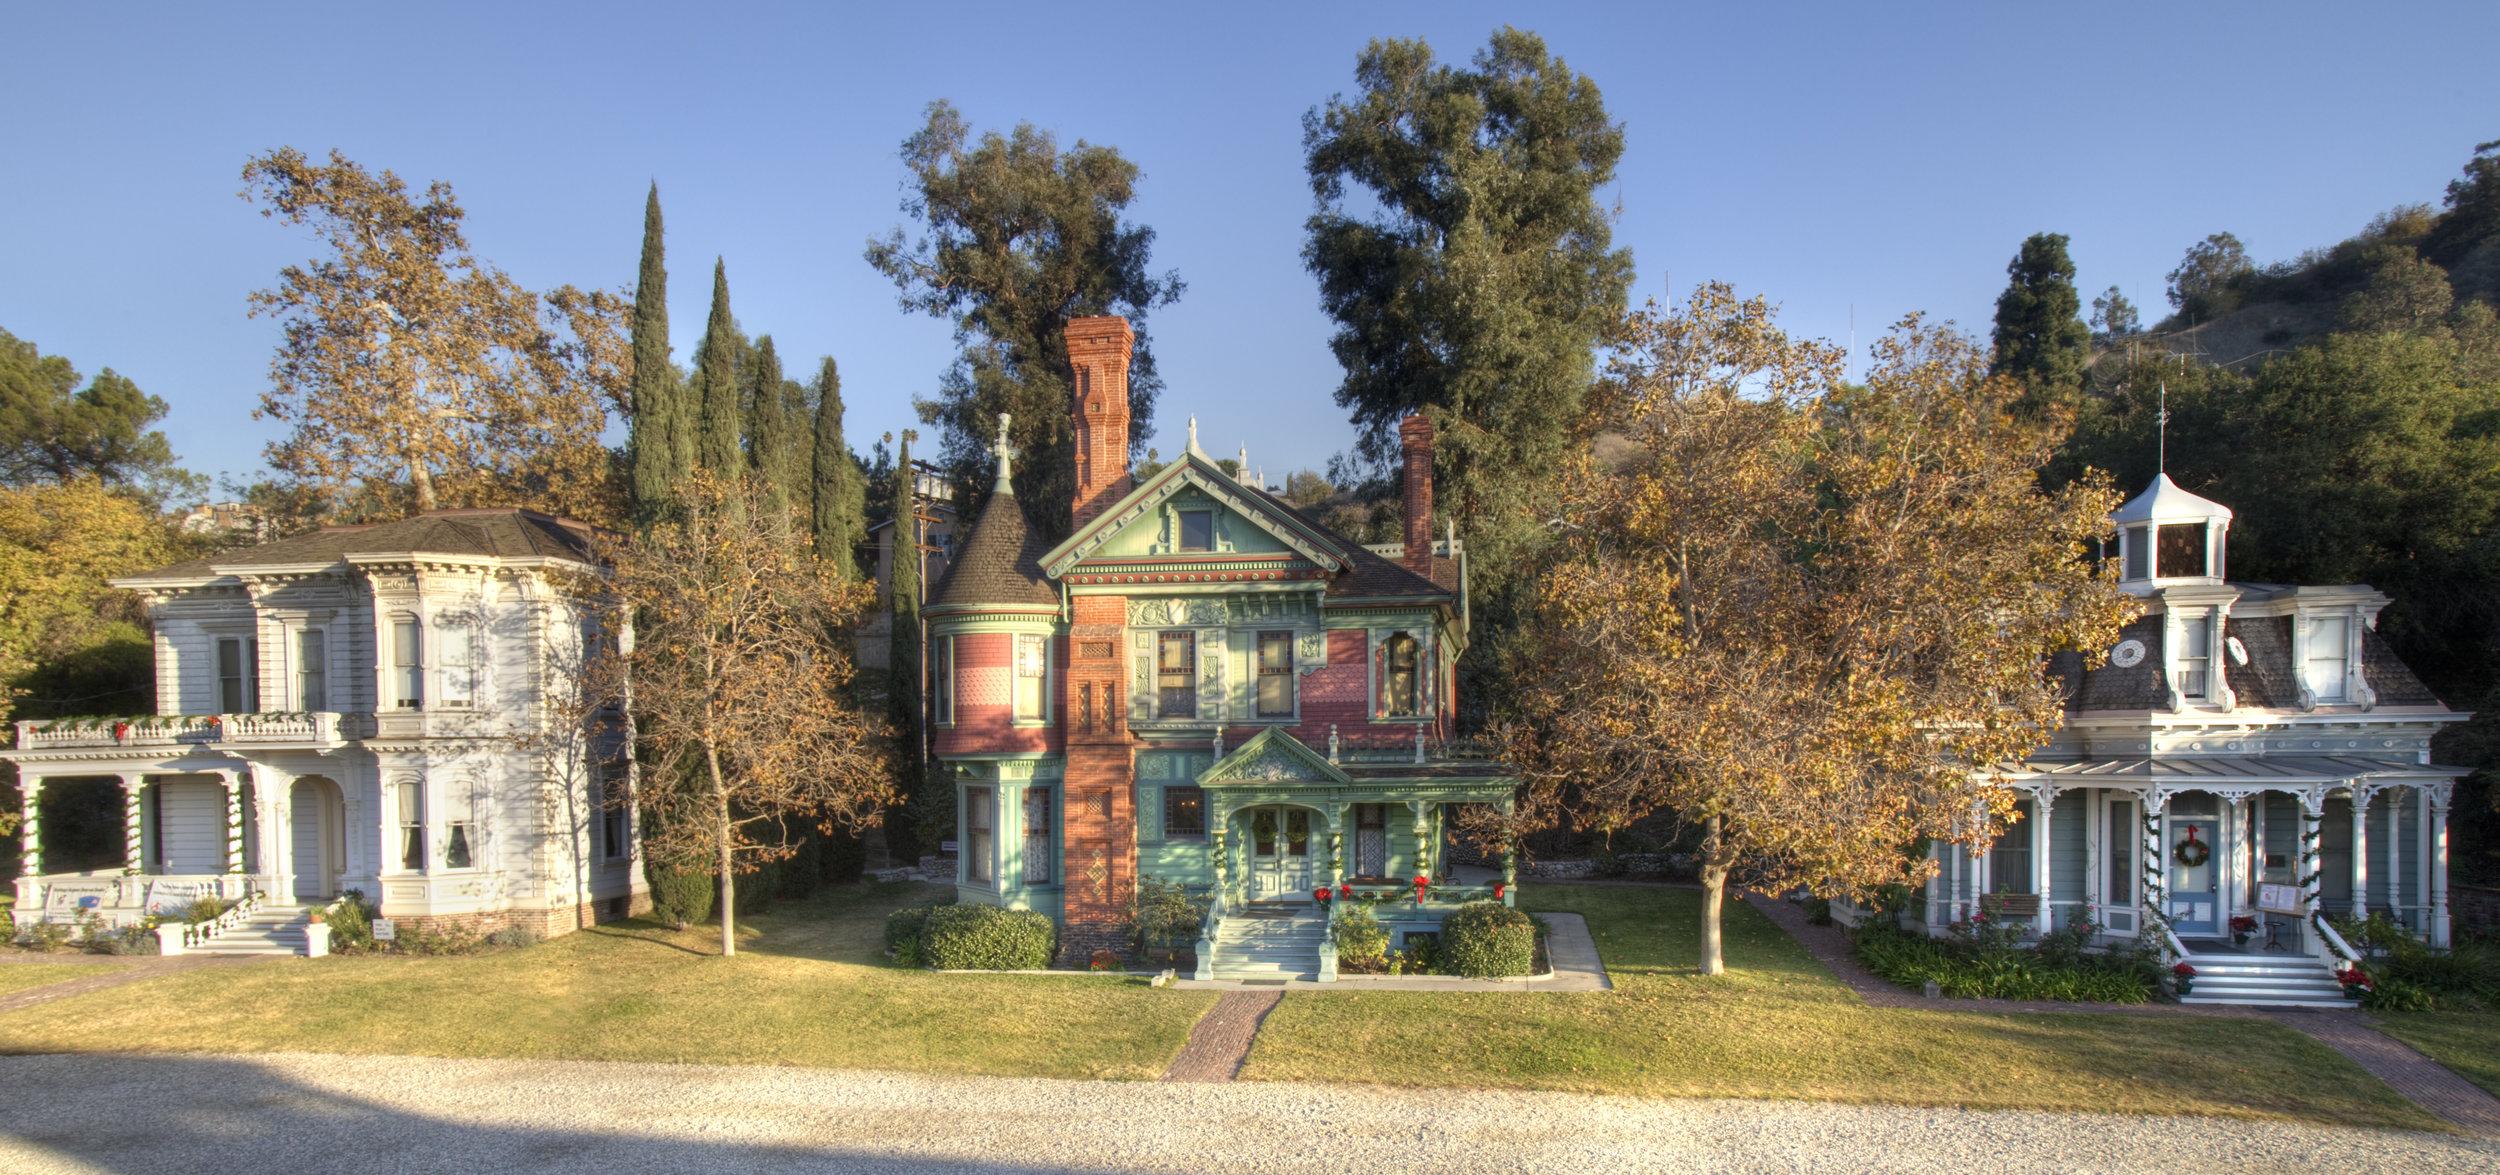 Sarah-barnard-design-architecture-neighborhood.jpg